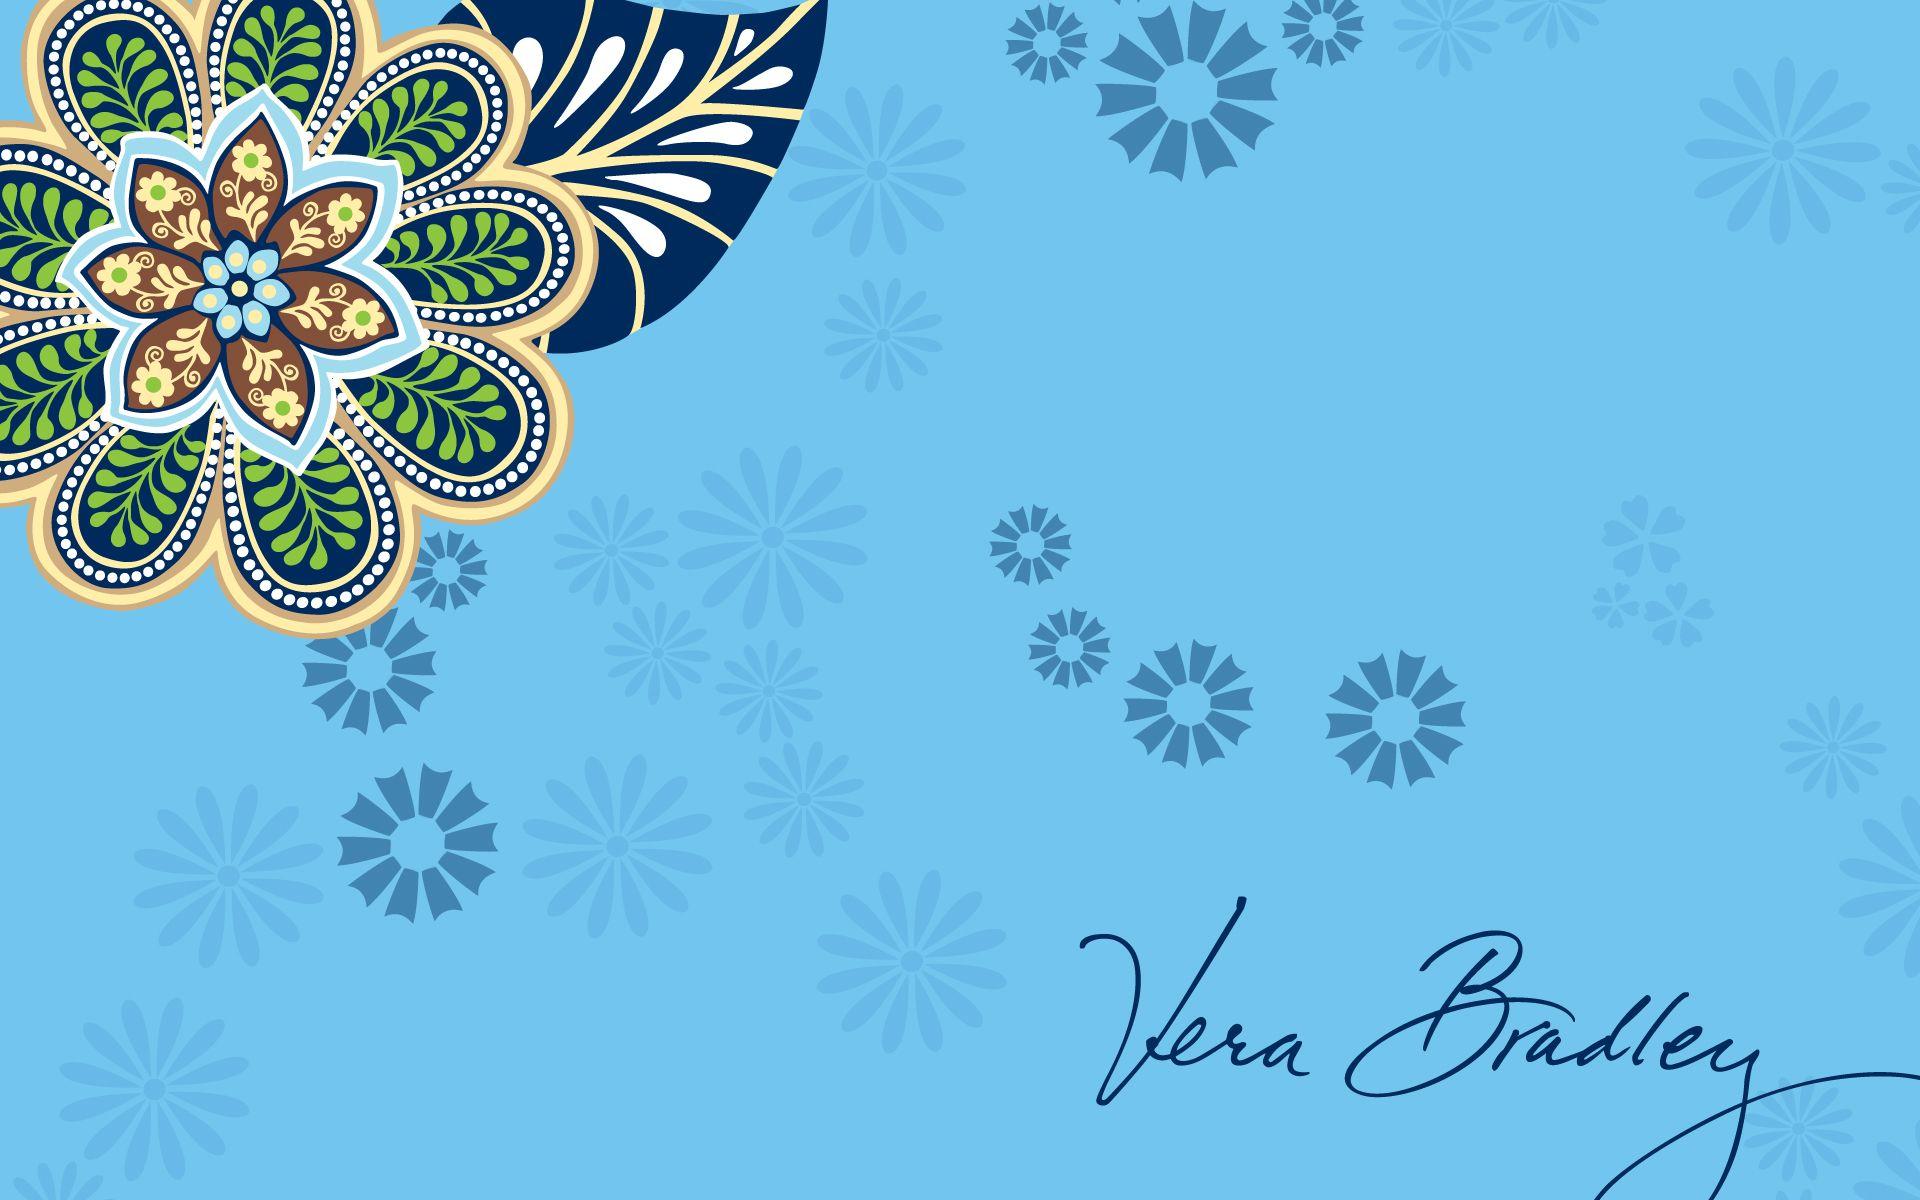 Vera Bradley Wall Paper Vb Wallpapers Wallpaper 35126636 Fanpop Fanclubs